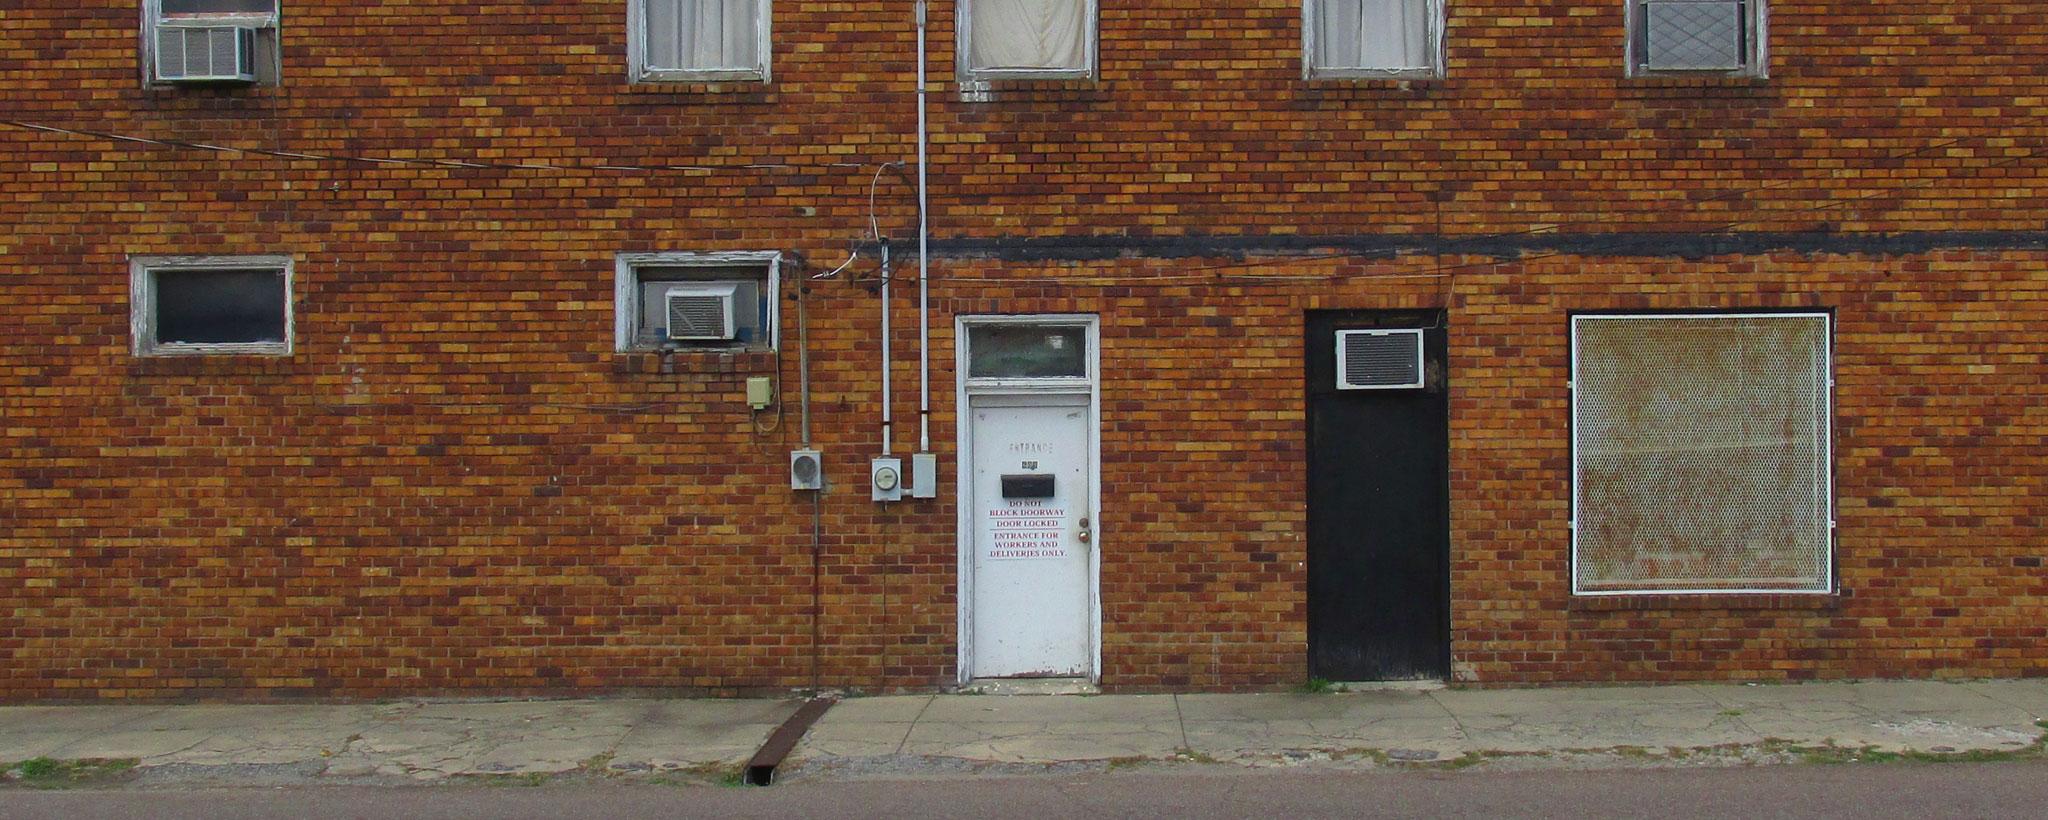 Doors on a Brick Wall